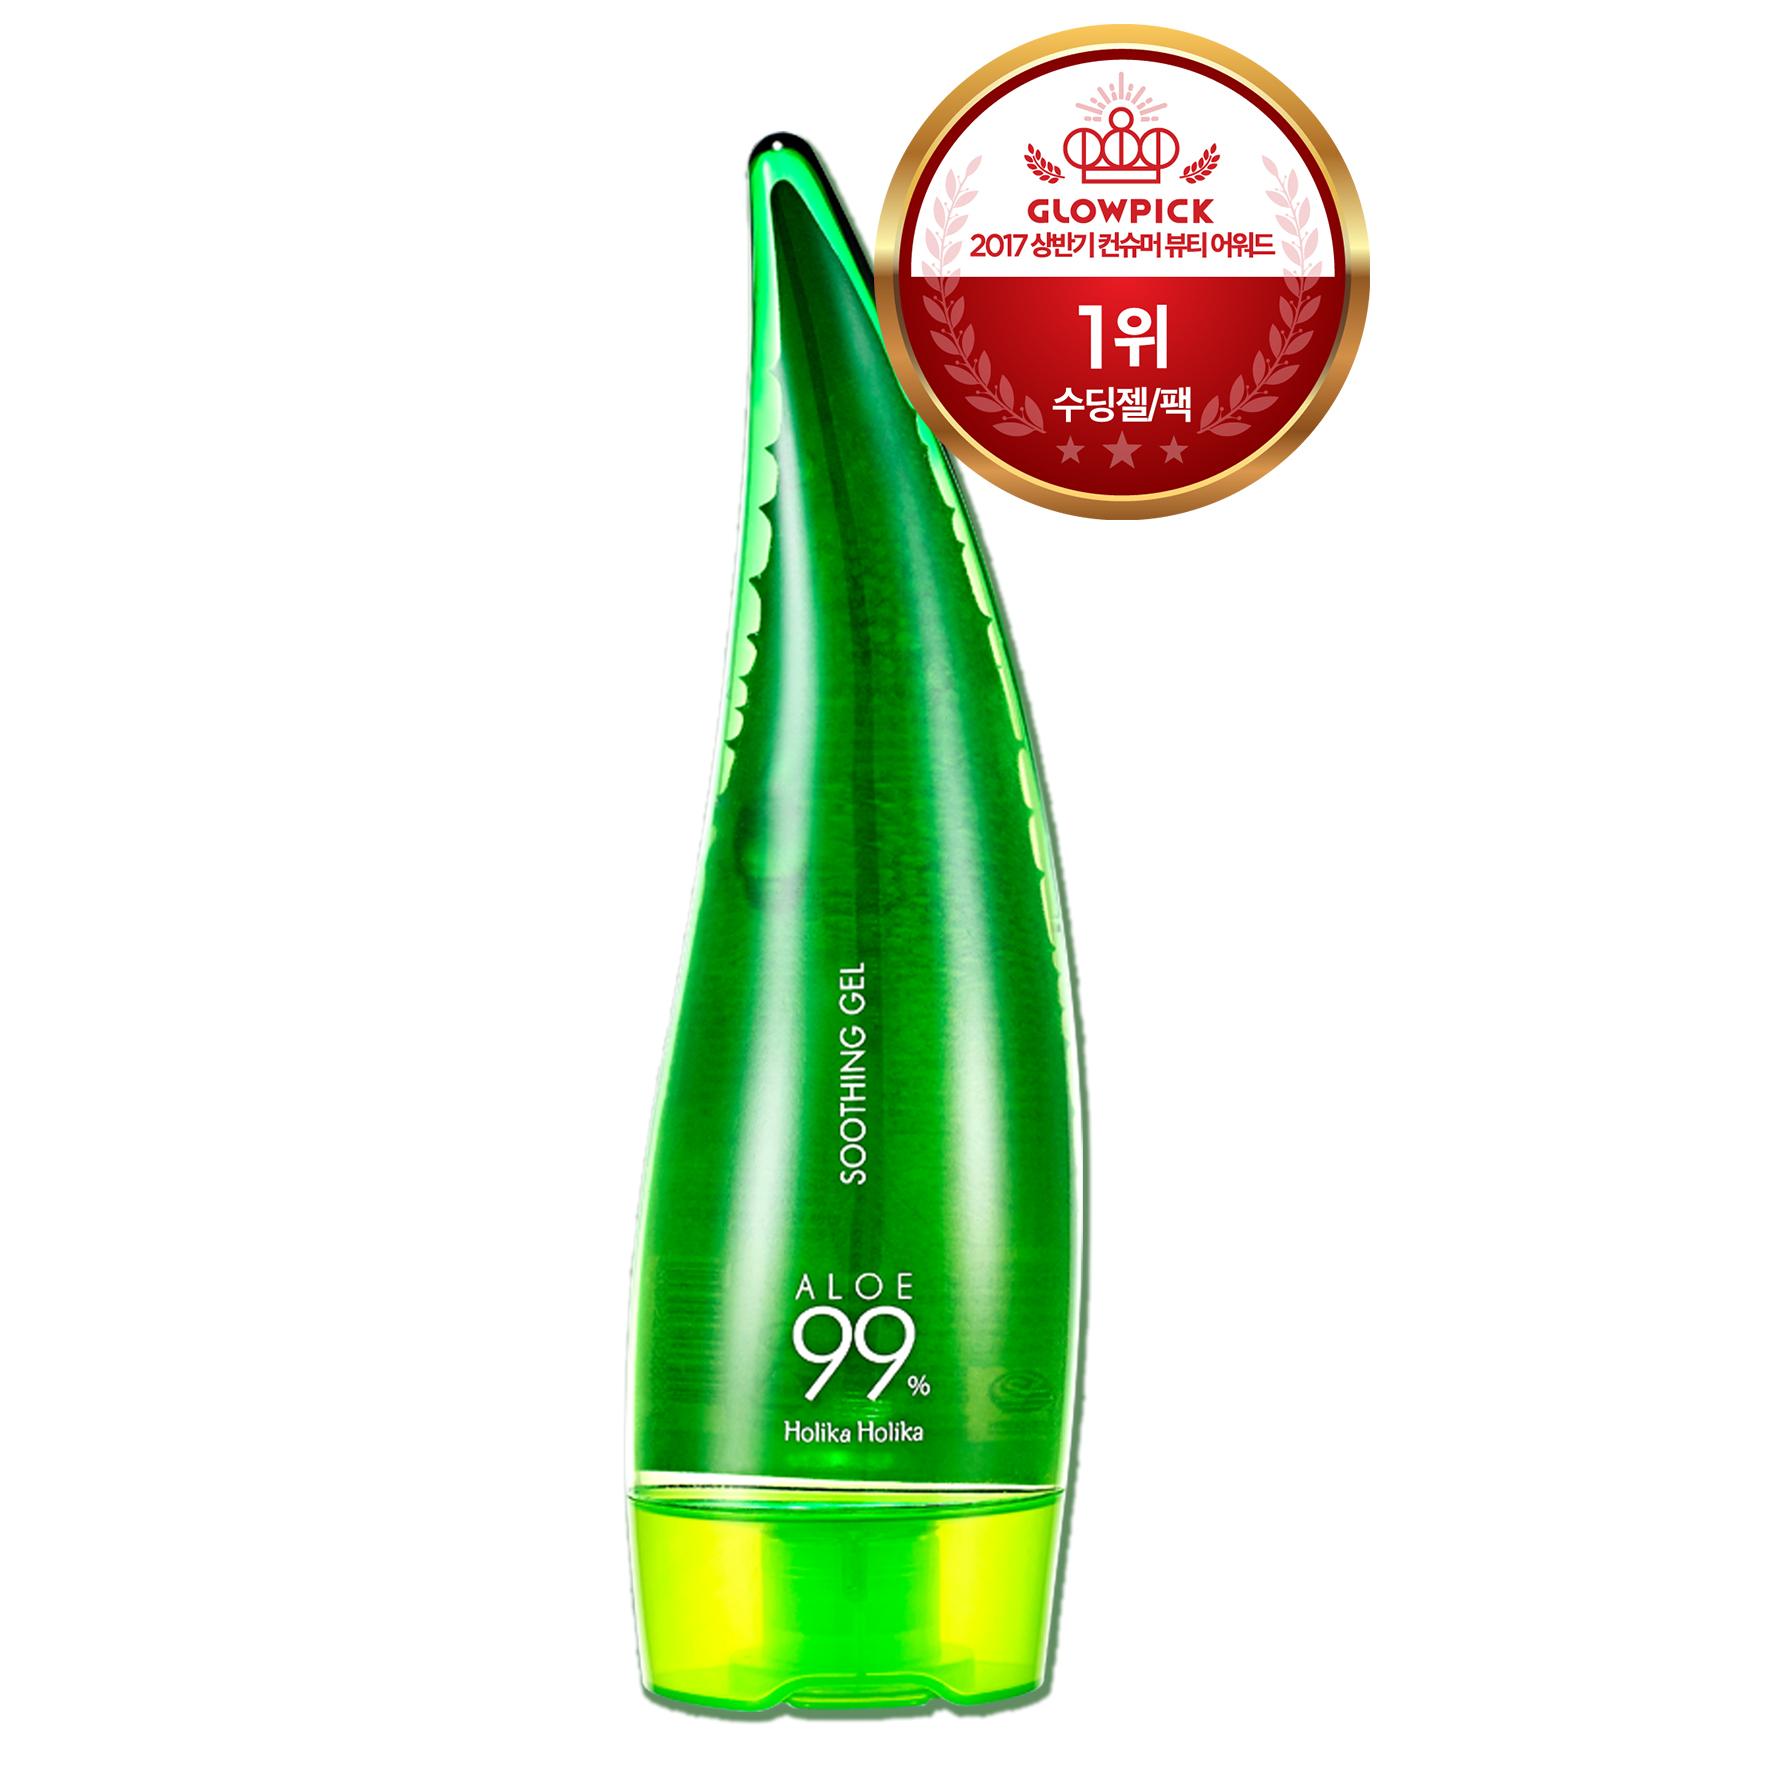 harga Holika Holika Aloe 99% Soothing Gel 250 ml - 20011878 Tokopedia.com